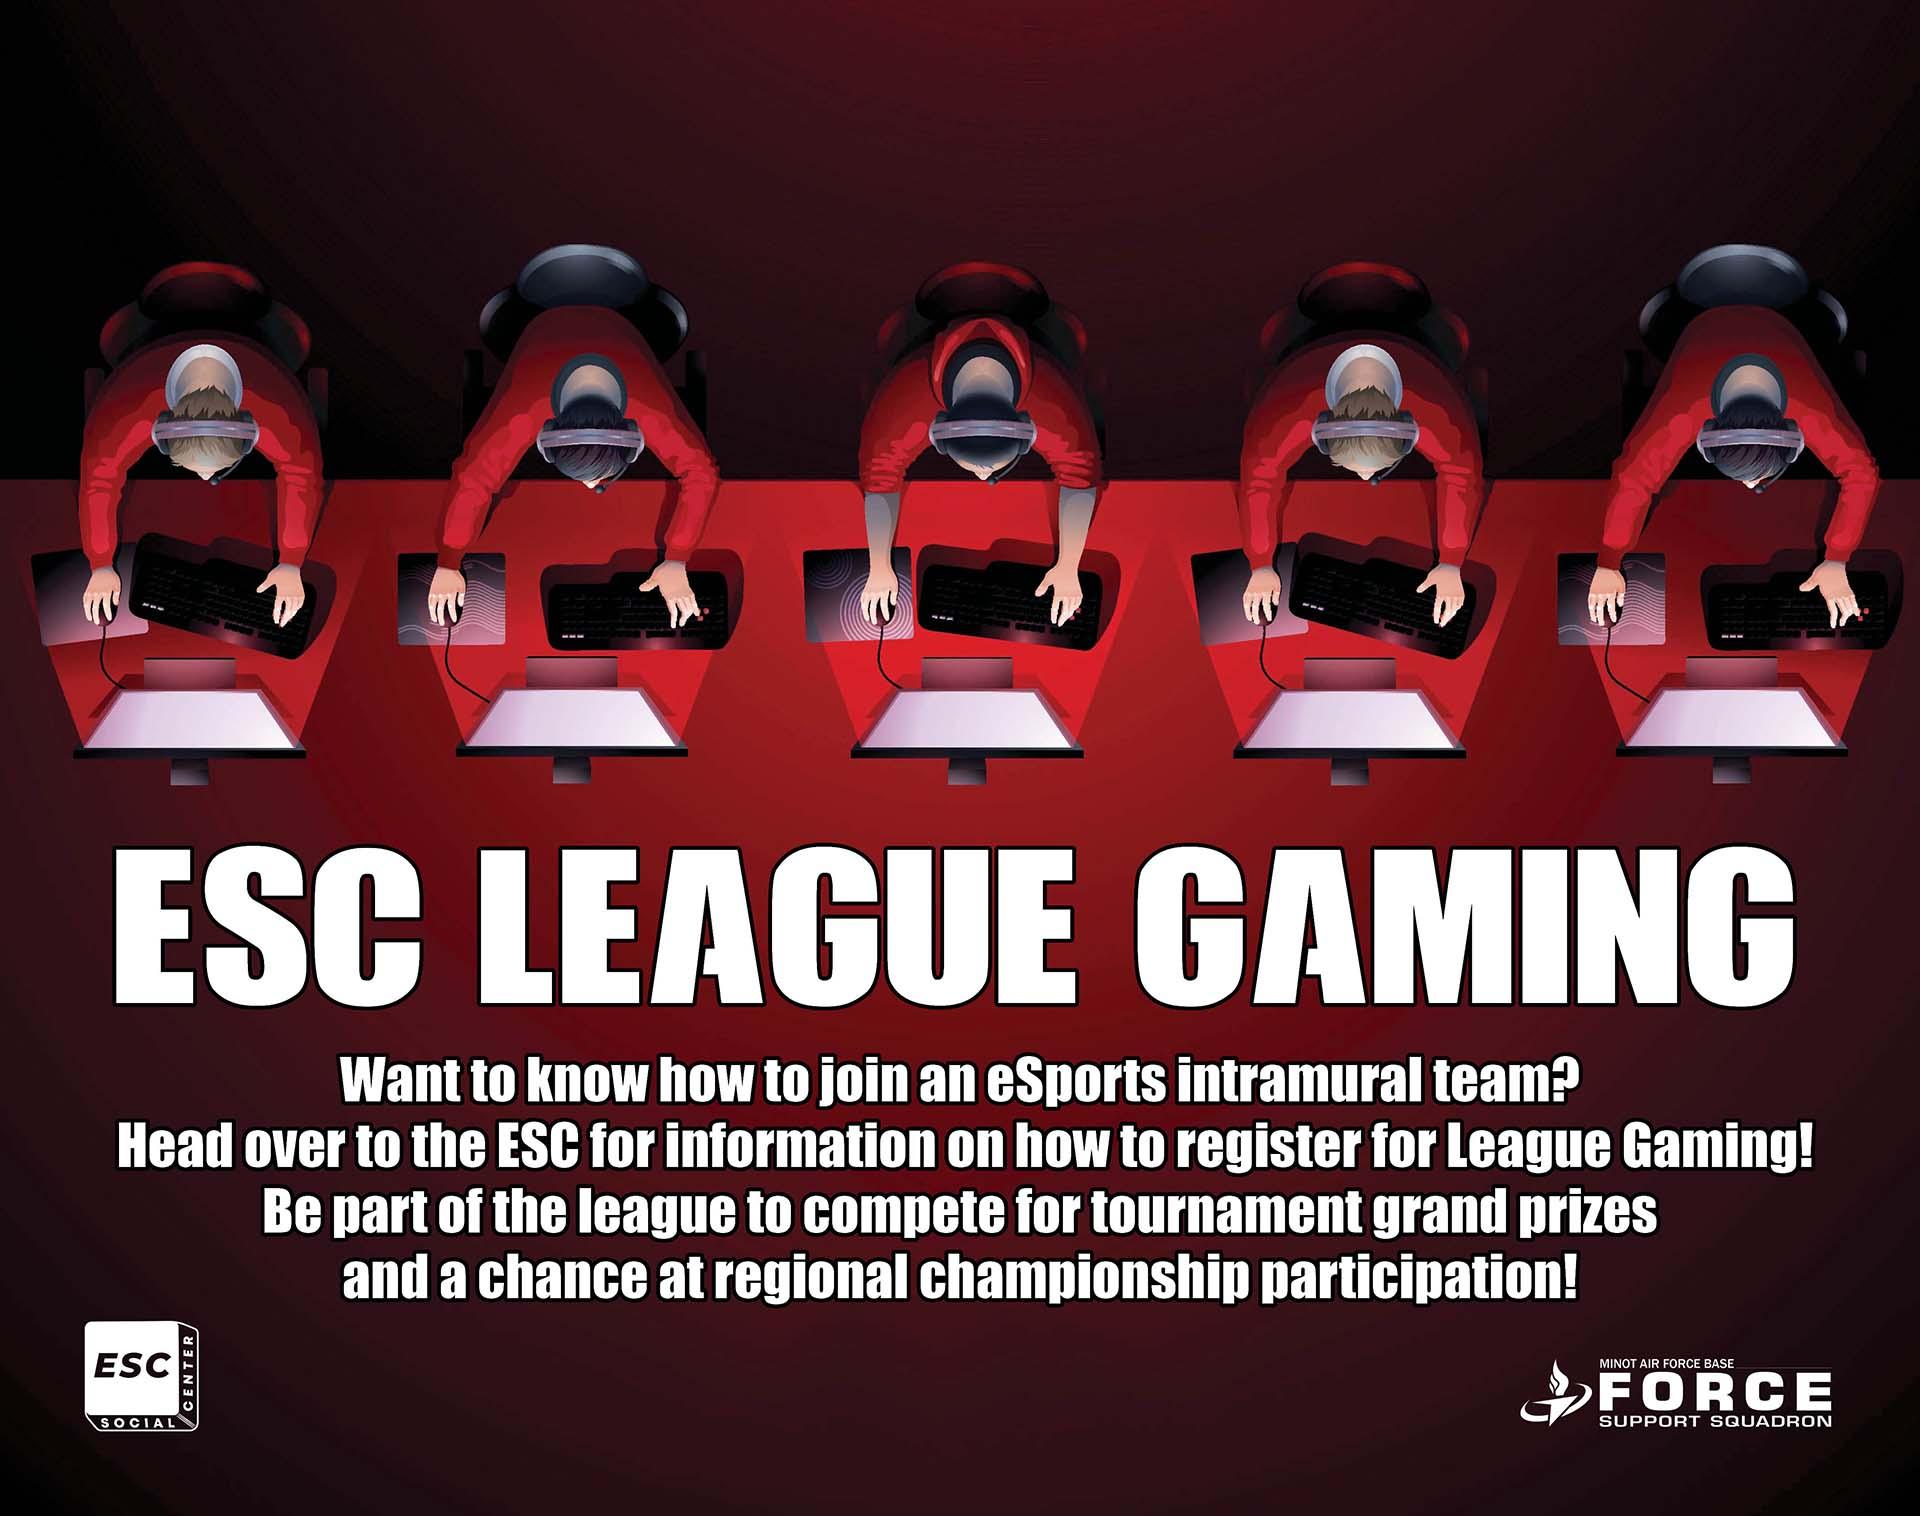 ESC - League Gaming